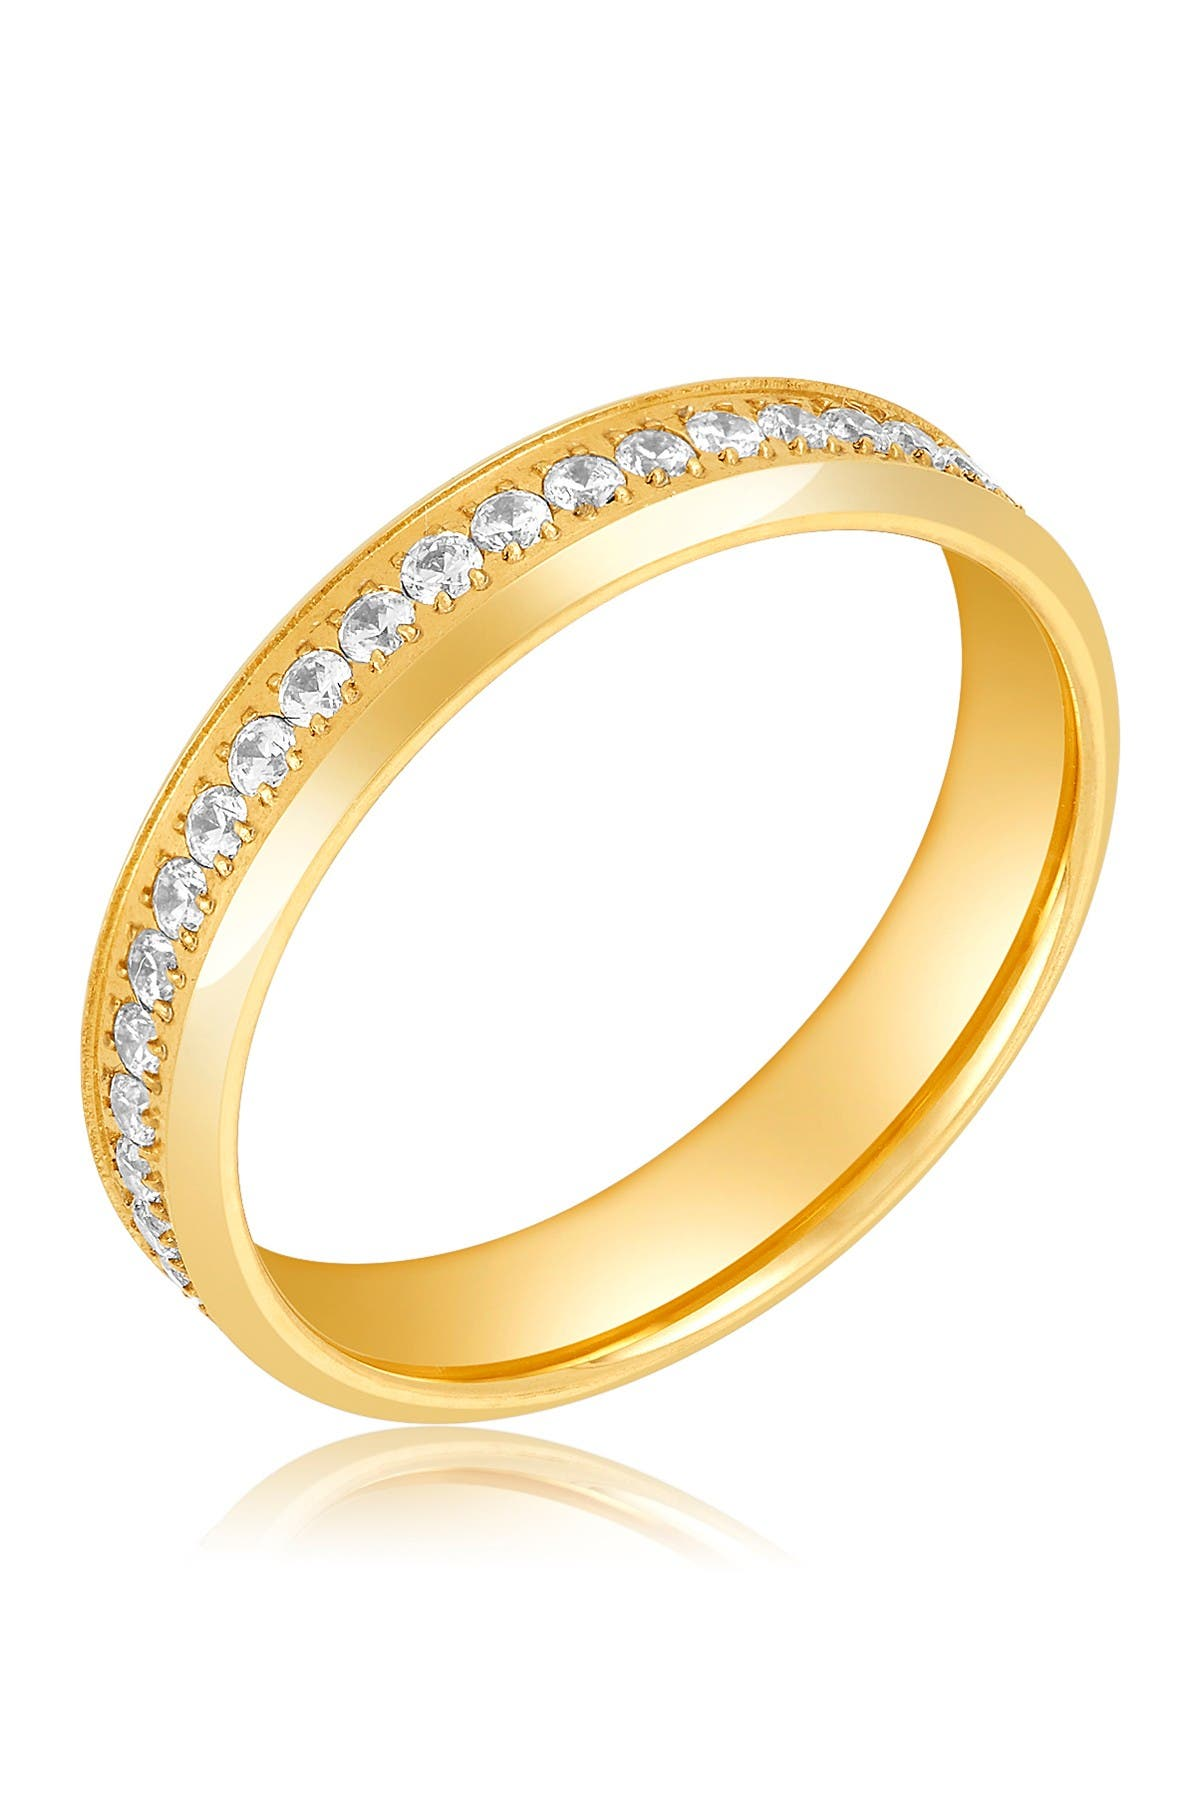 ADORNIA 14K Yellow Gold Eternity Ring